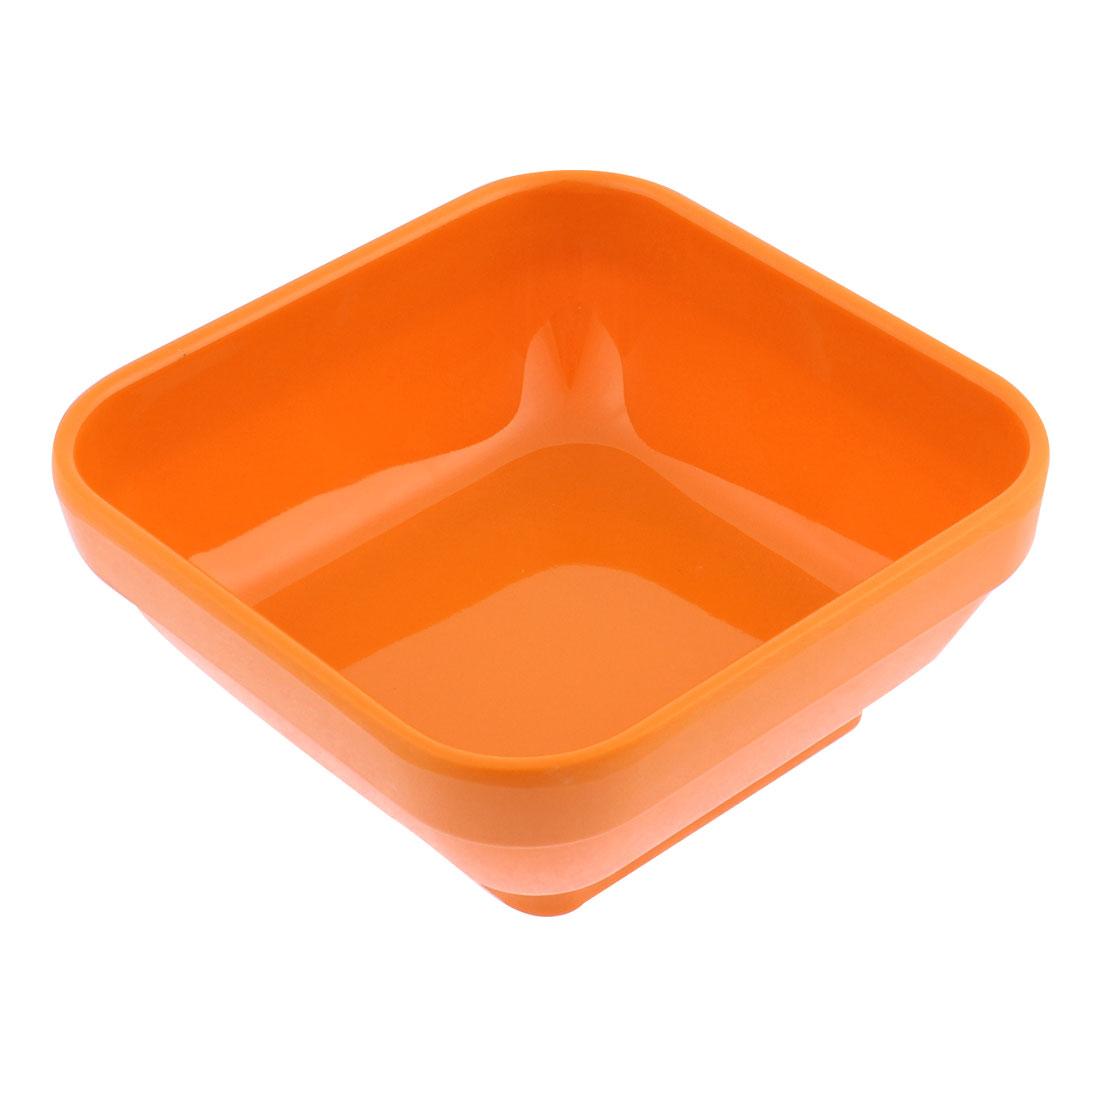 Plastic Square Shaped Dessert Food Soup Serving Bowl Orangered 12 x 12cm